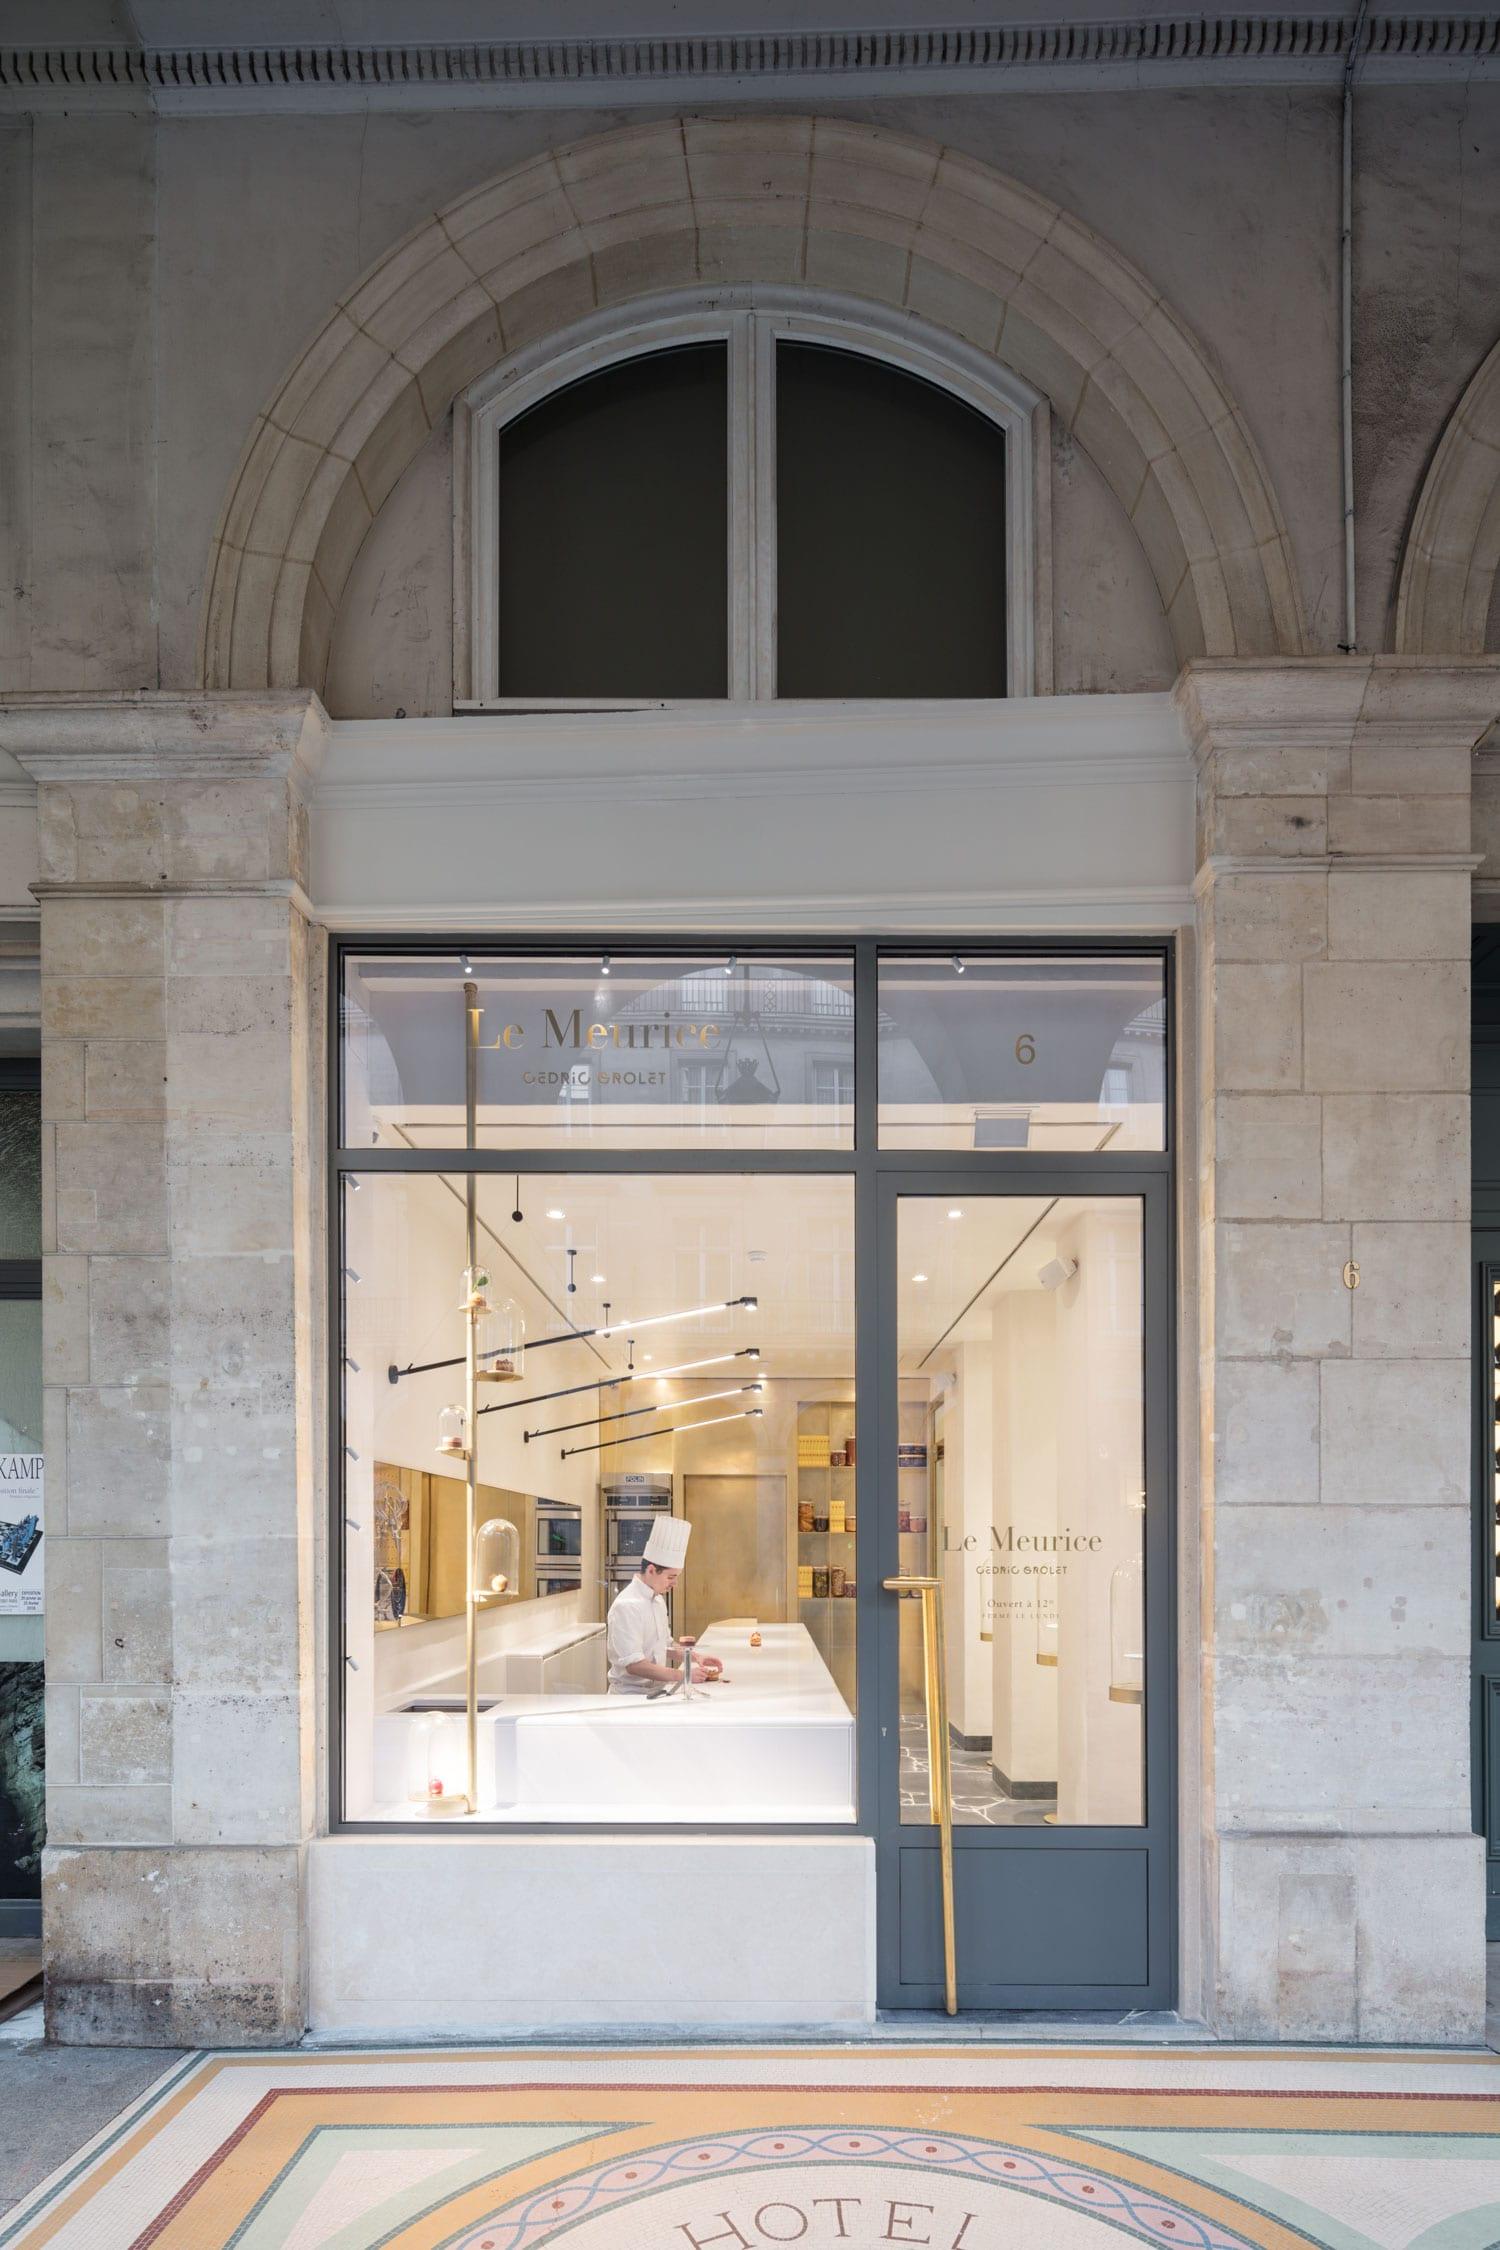 Cédric Grolet\u0027s Meurice Patisserie in Paris by Ciguë